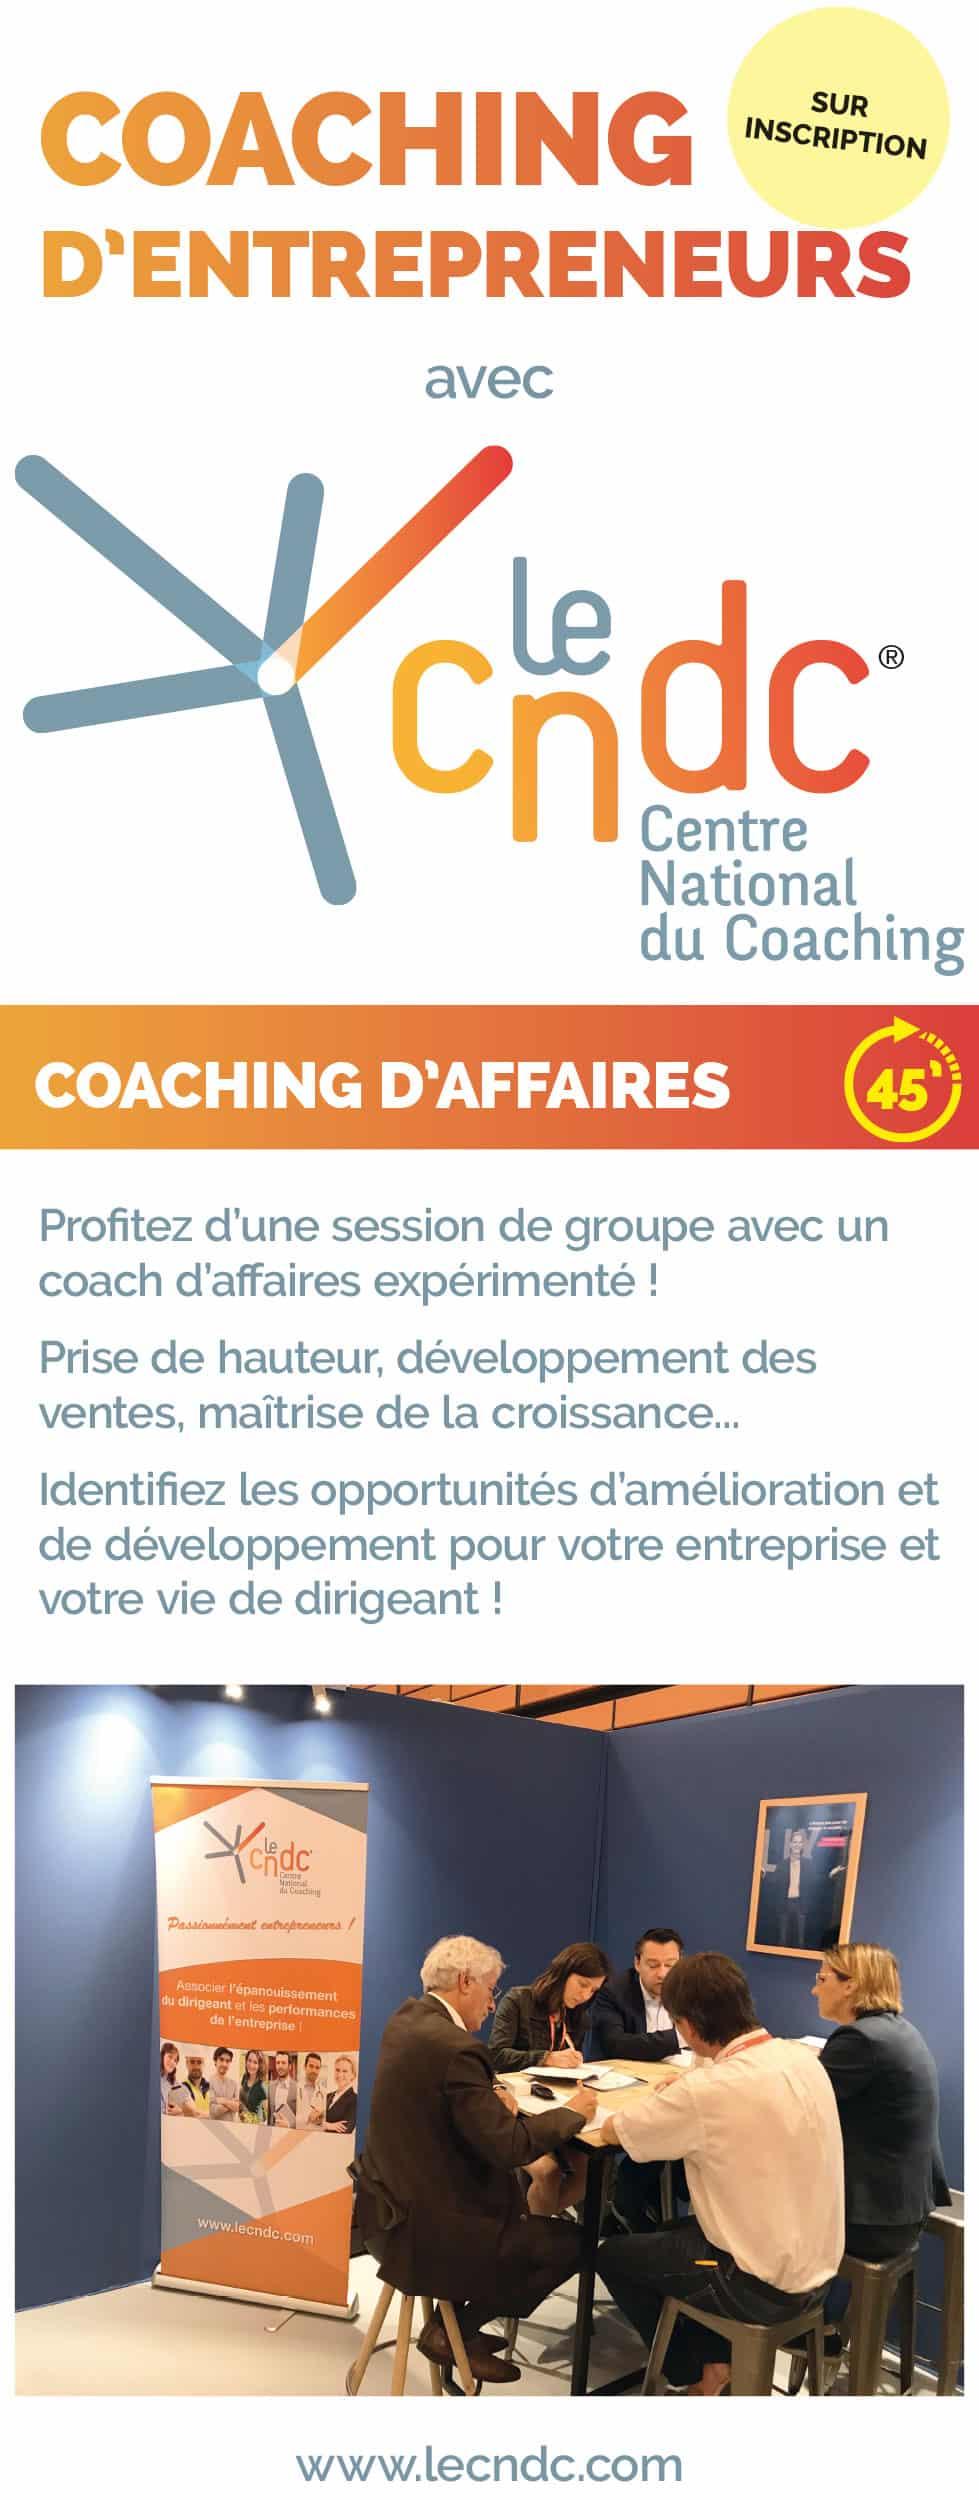 Kakémono Salon Le Centre Naitonal du Coaching